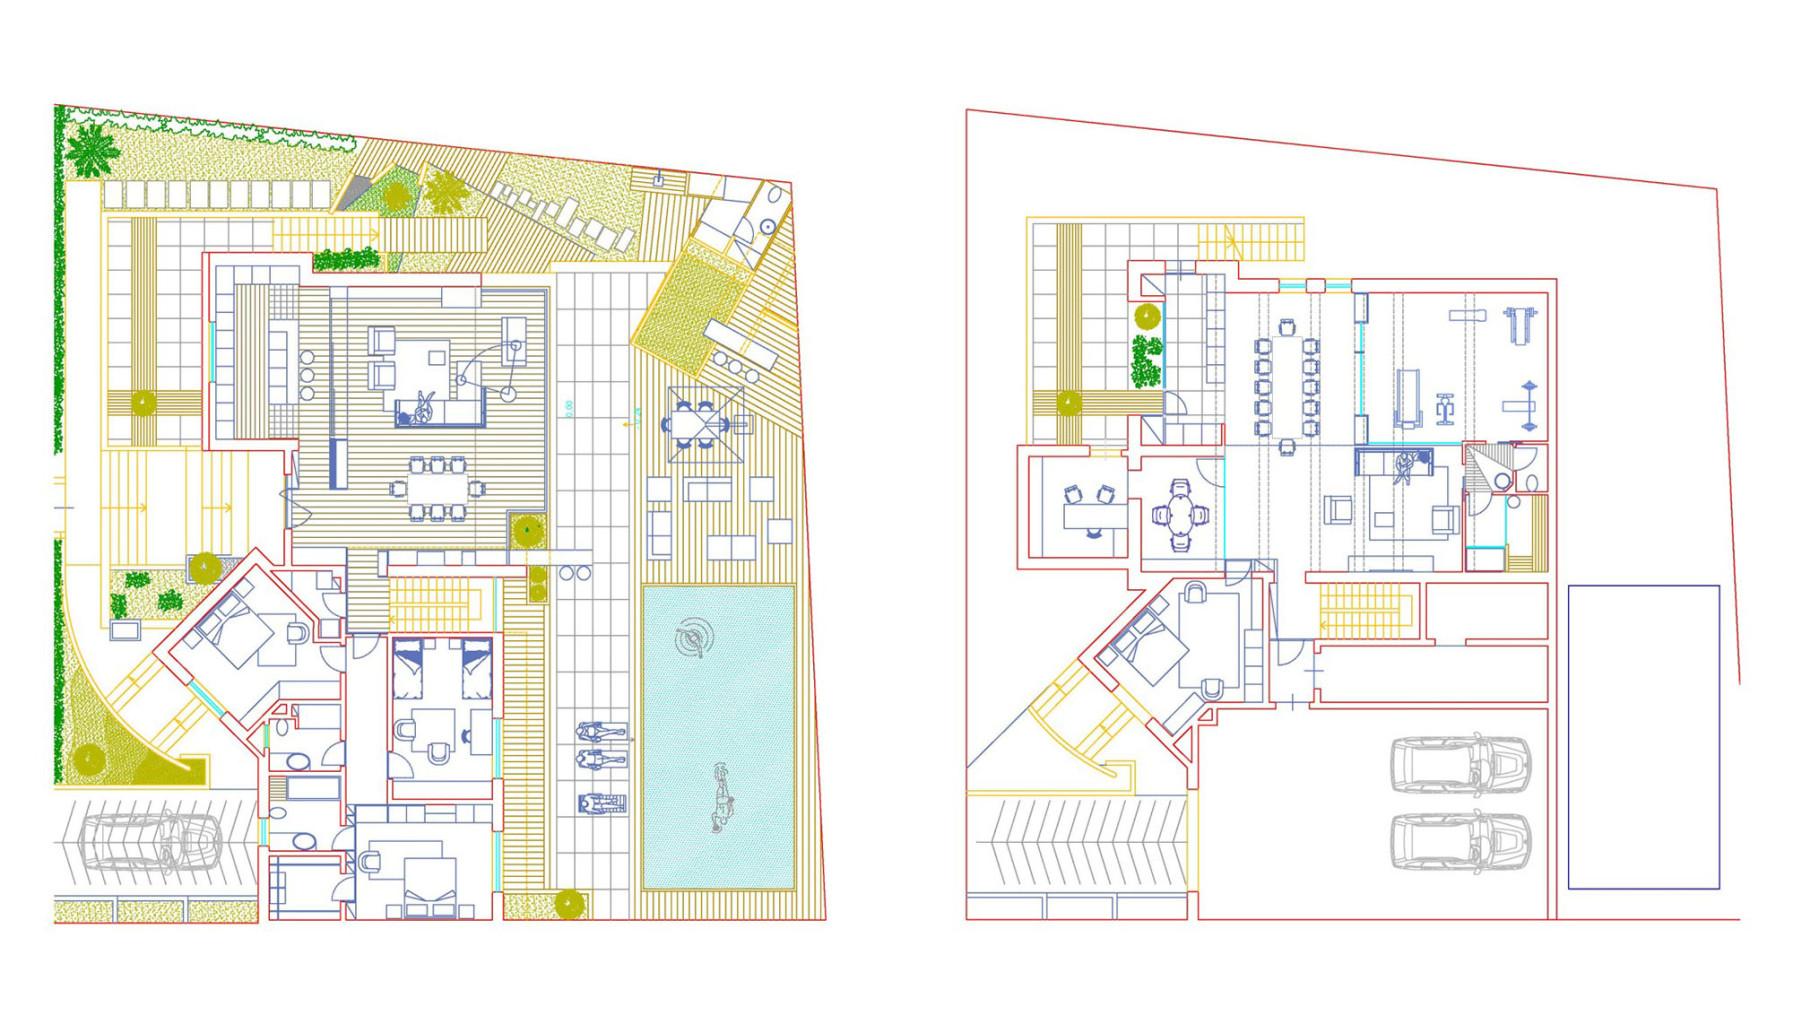 birguma-villa-print-2-a2_page_1-1